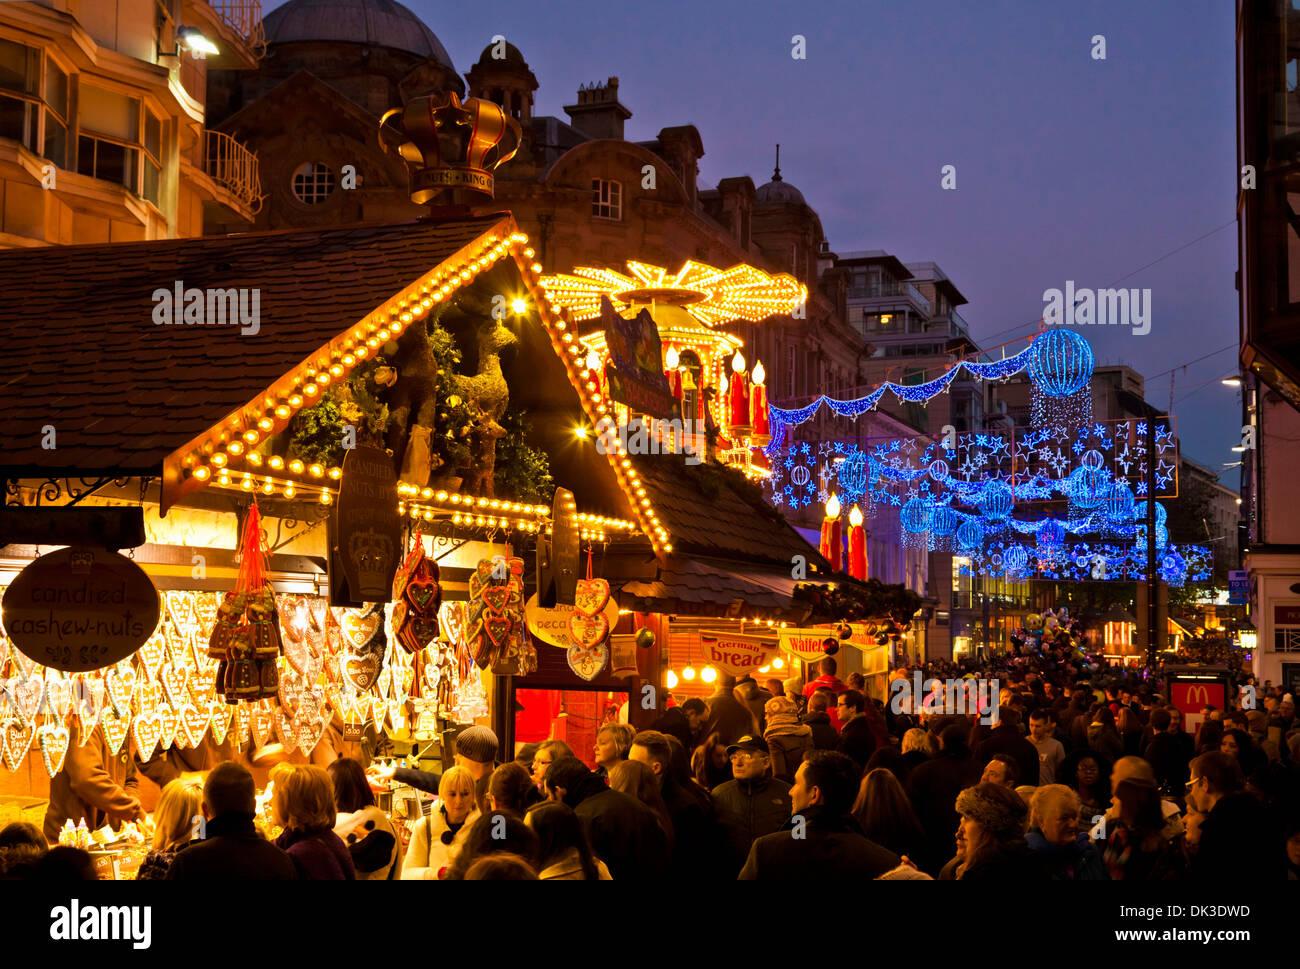 birmingham christmas market also known as birmingham frankfurt christmas market birmingham west midlands england stock - Birmingham Christmas Market